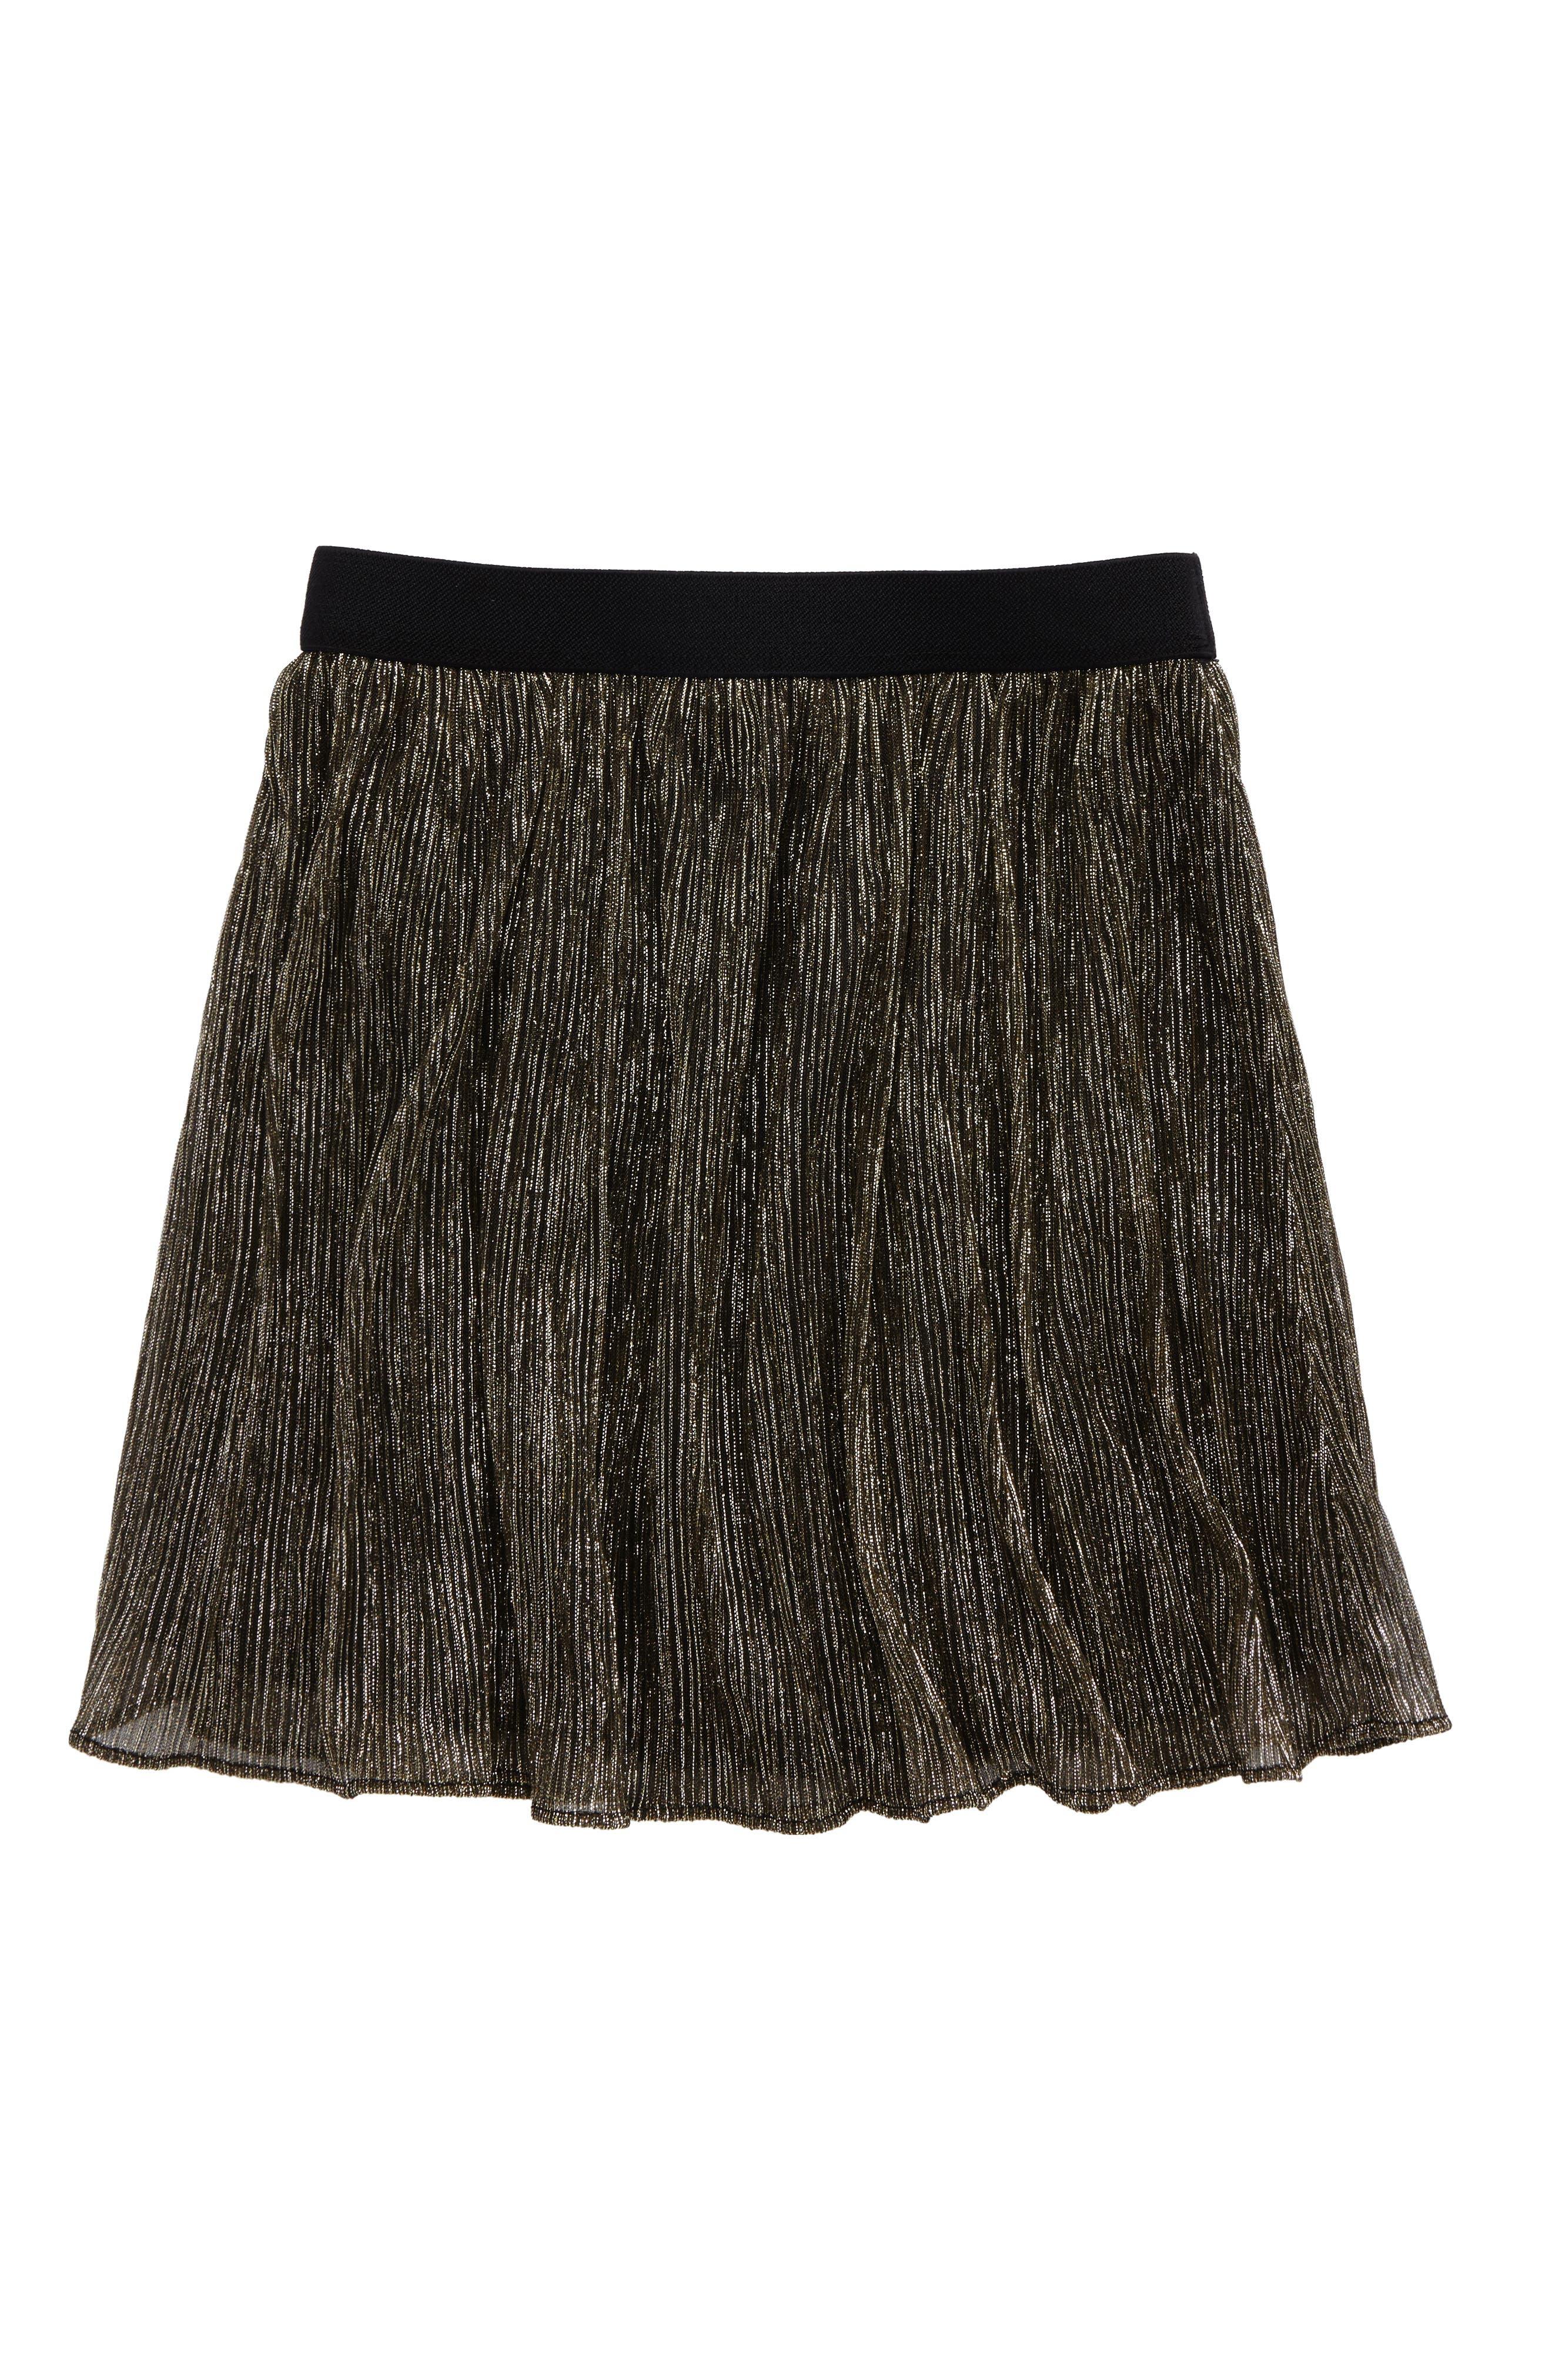 Pleated Metallic Skirt,                             Main thumbnail 1, color,                             220